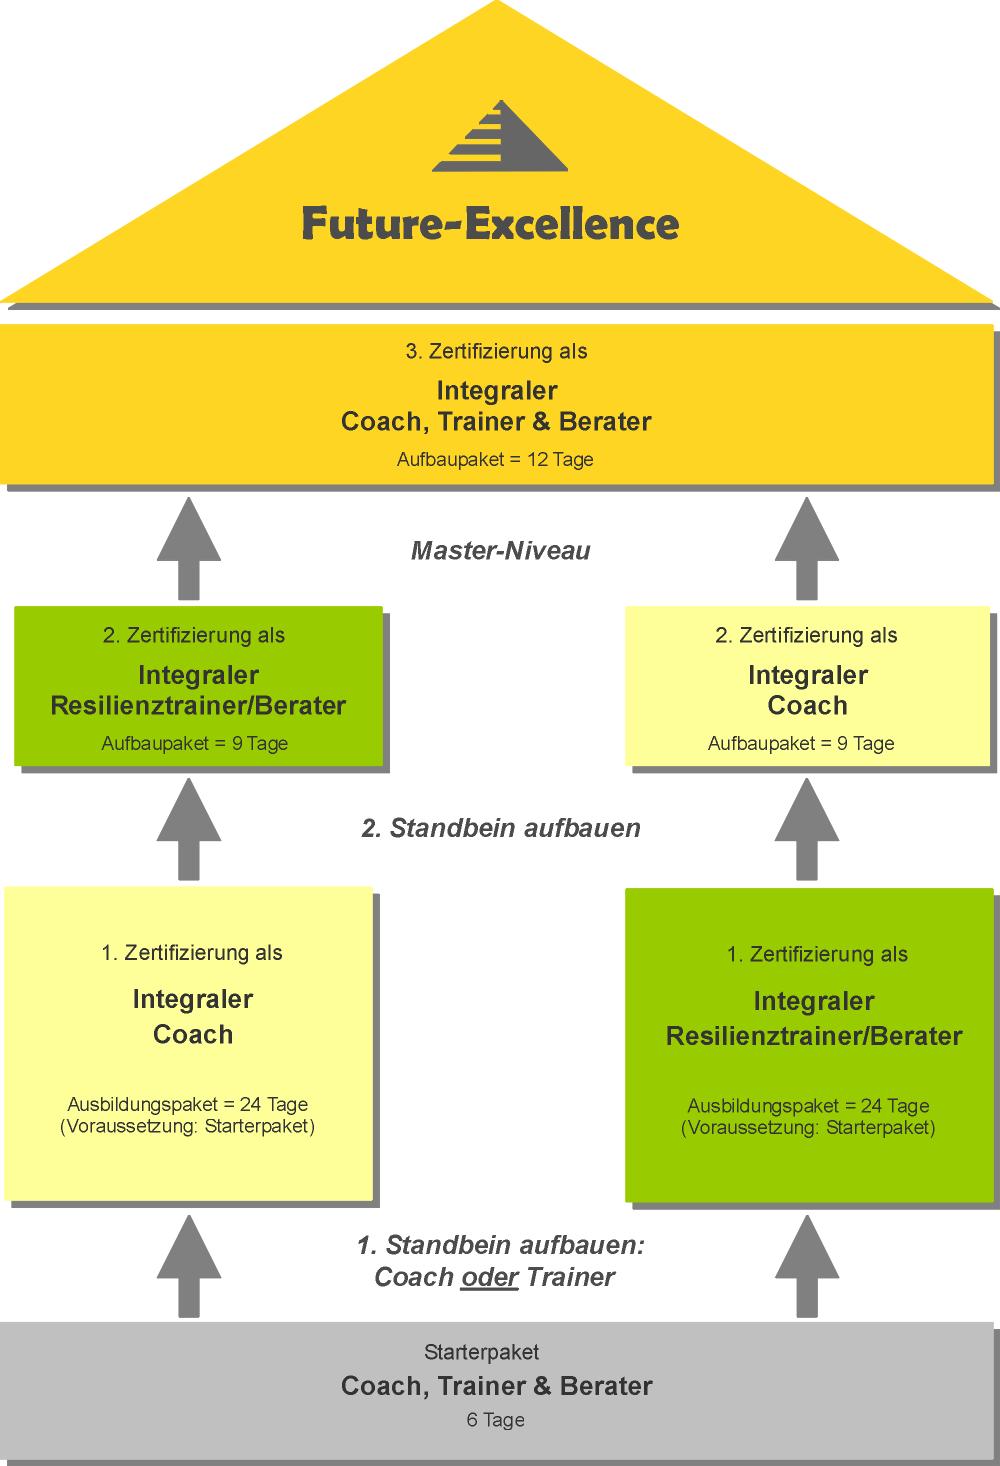 Modulare Ausbildung zum integralen Coach, Resilienztrainer / Berater